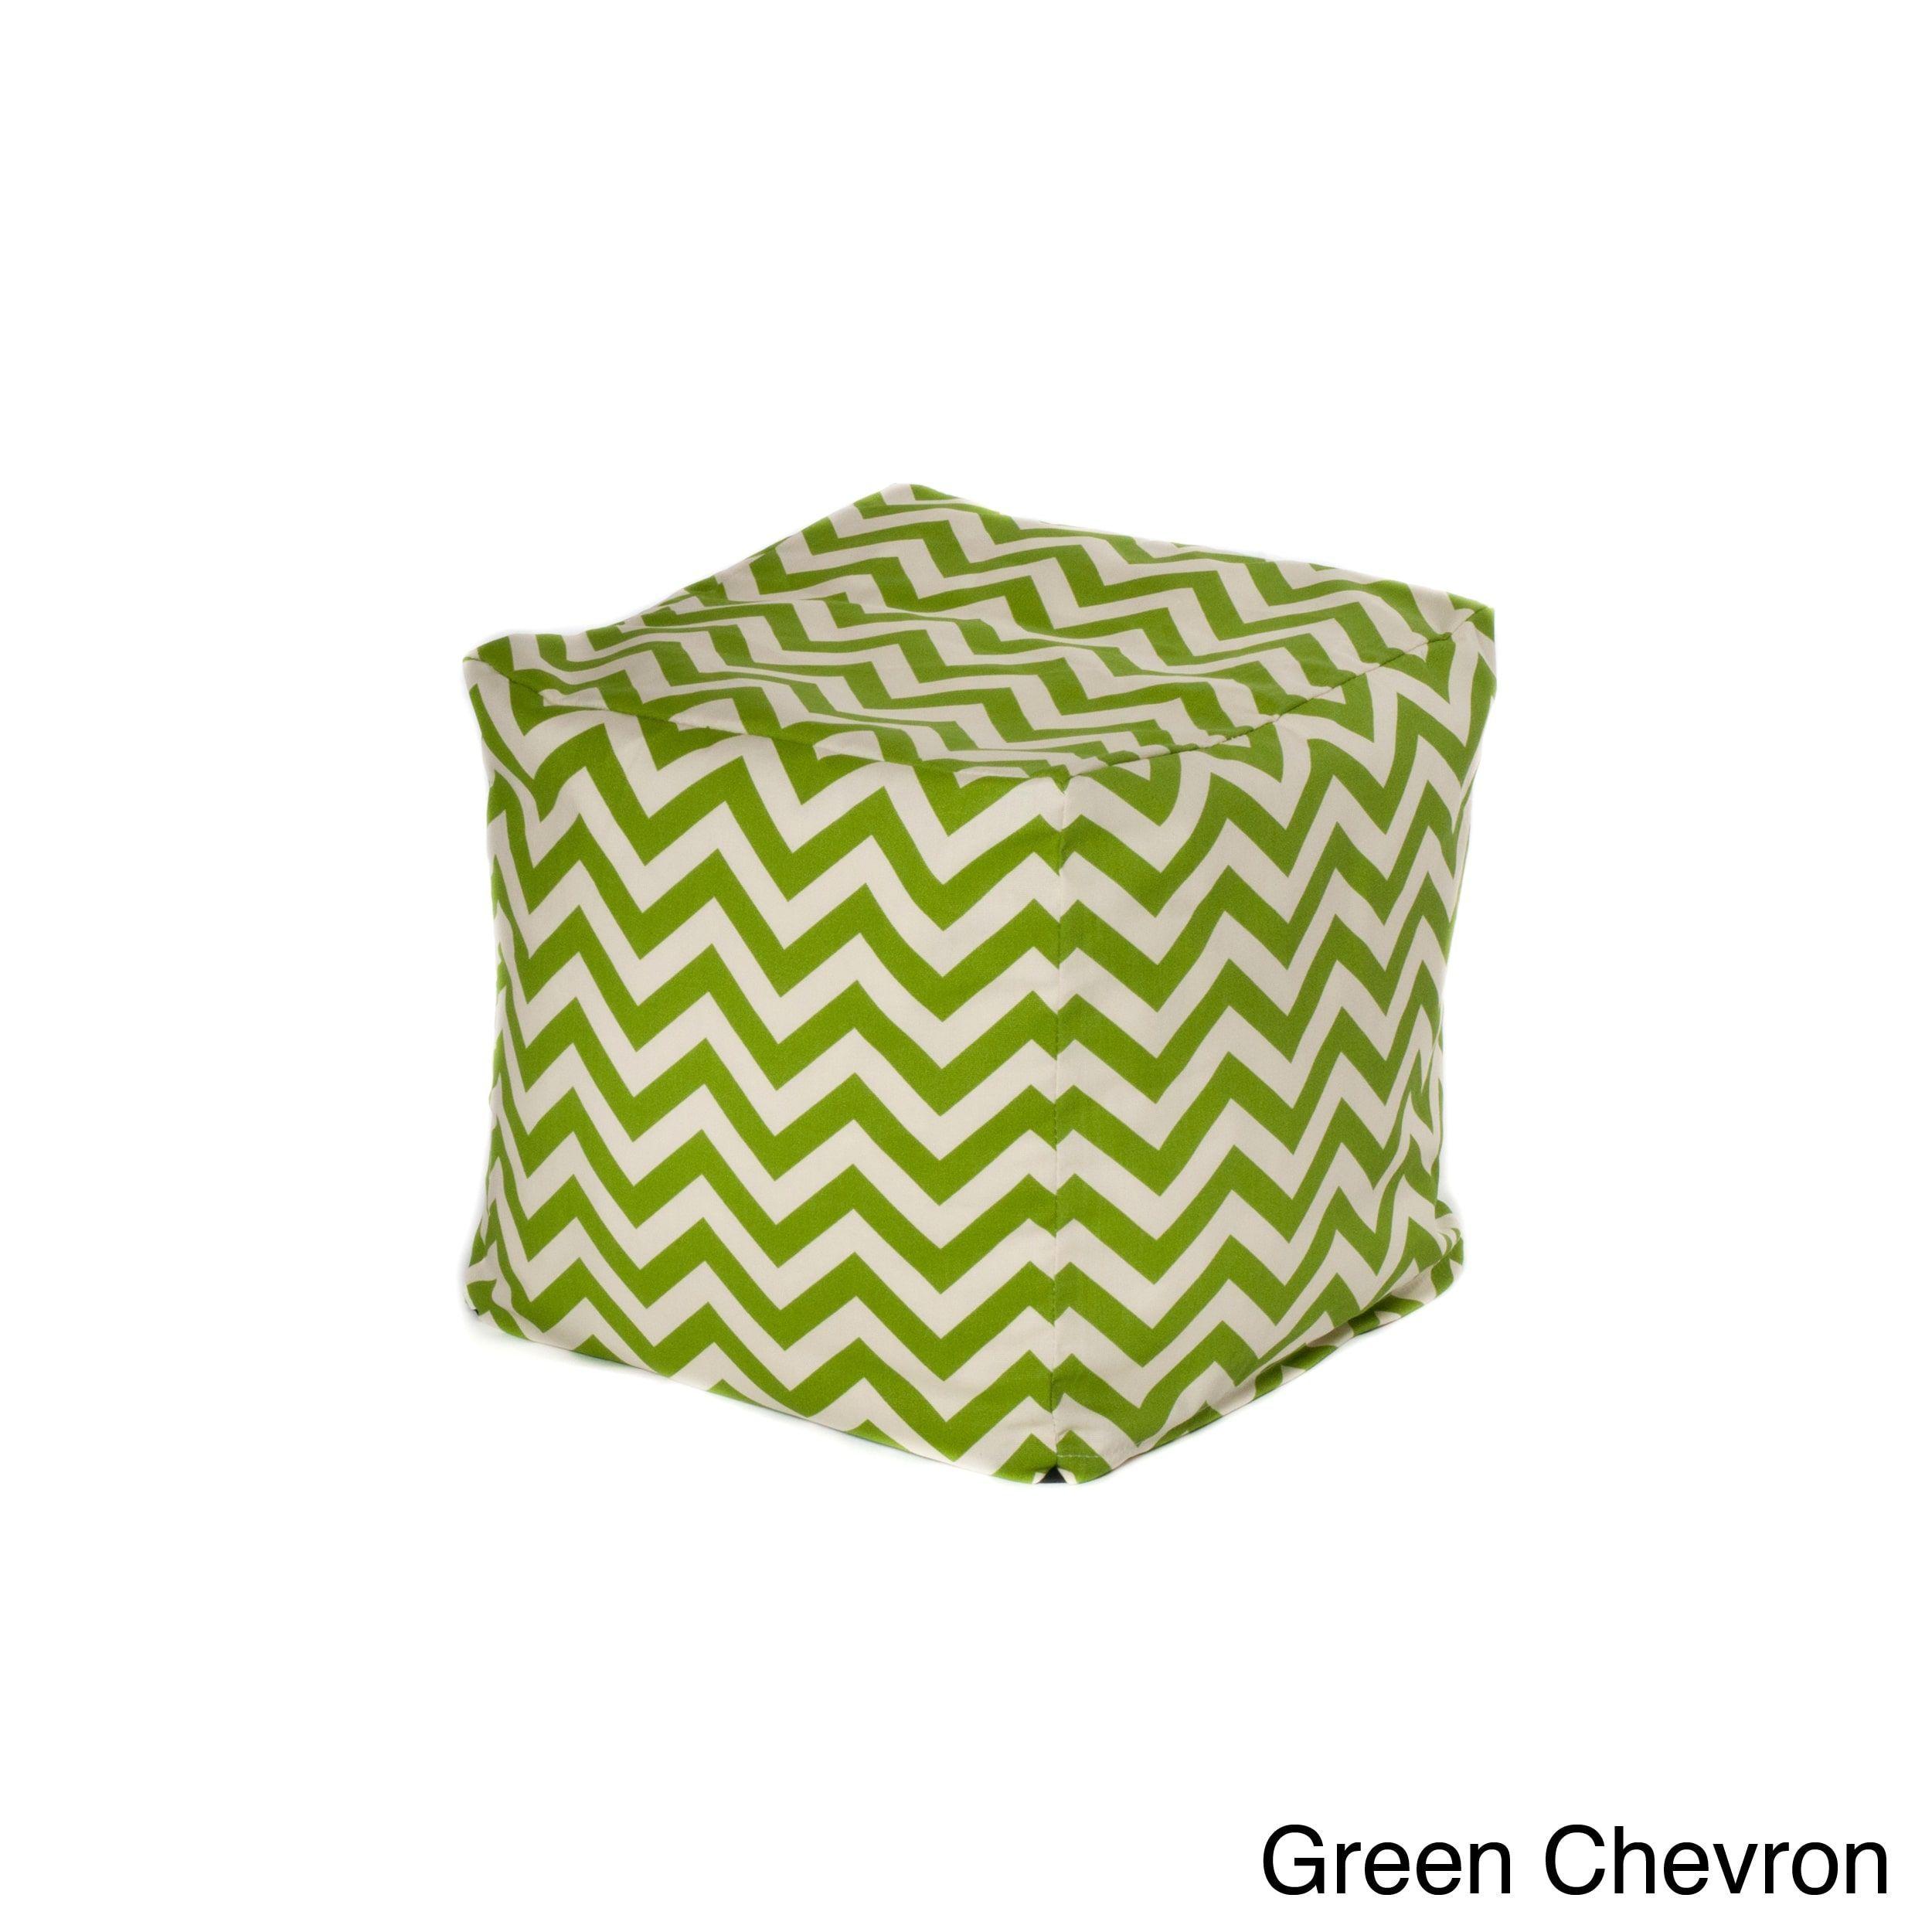 Sensational Chateau Designs Chevron Outdoor Beanbag Cube Yellow Patio Inzonedesignstudio Interior Chair Design Inzonedesignstudiocom